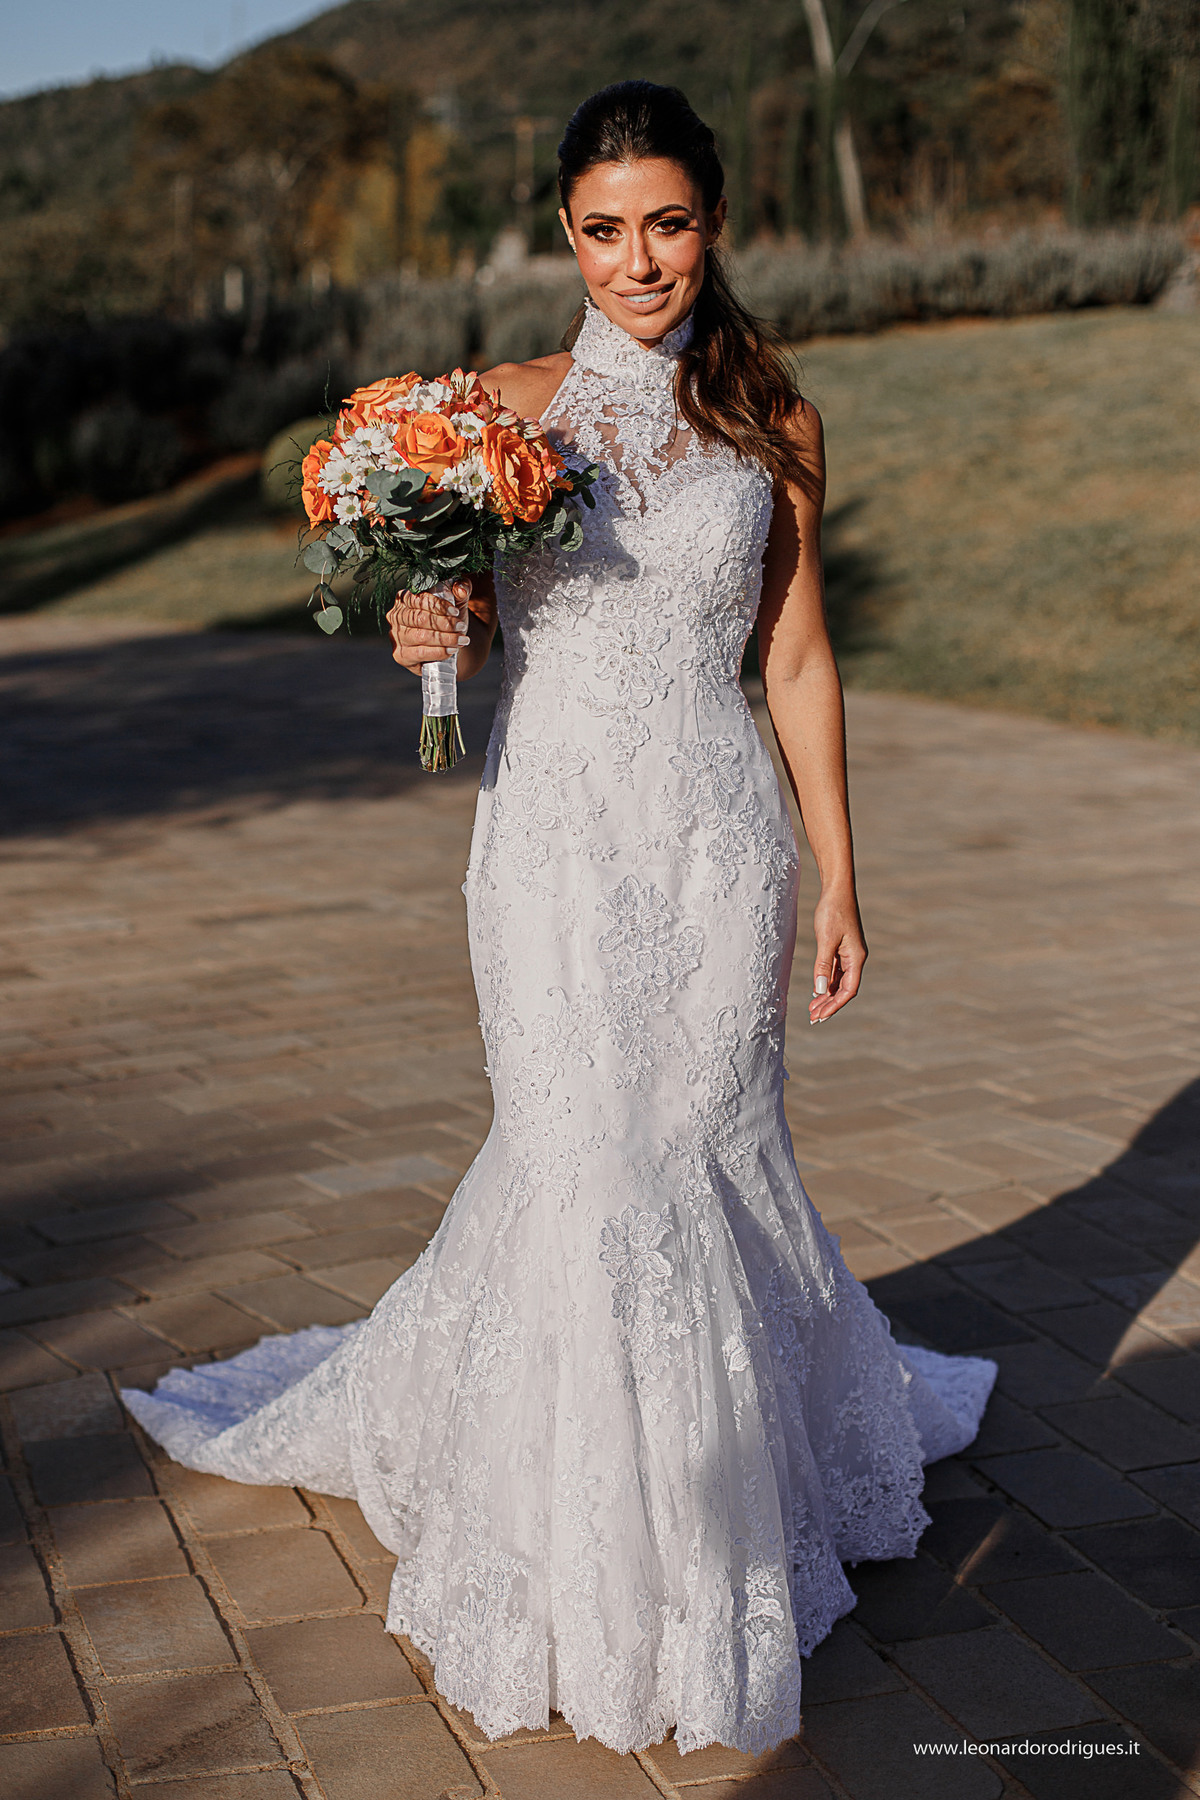 caza wilfrido casamento luxo vestido noiva maquiadora maquiagem fotografo destination wedding editorial shotting gramado serra gaucha flores